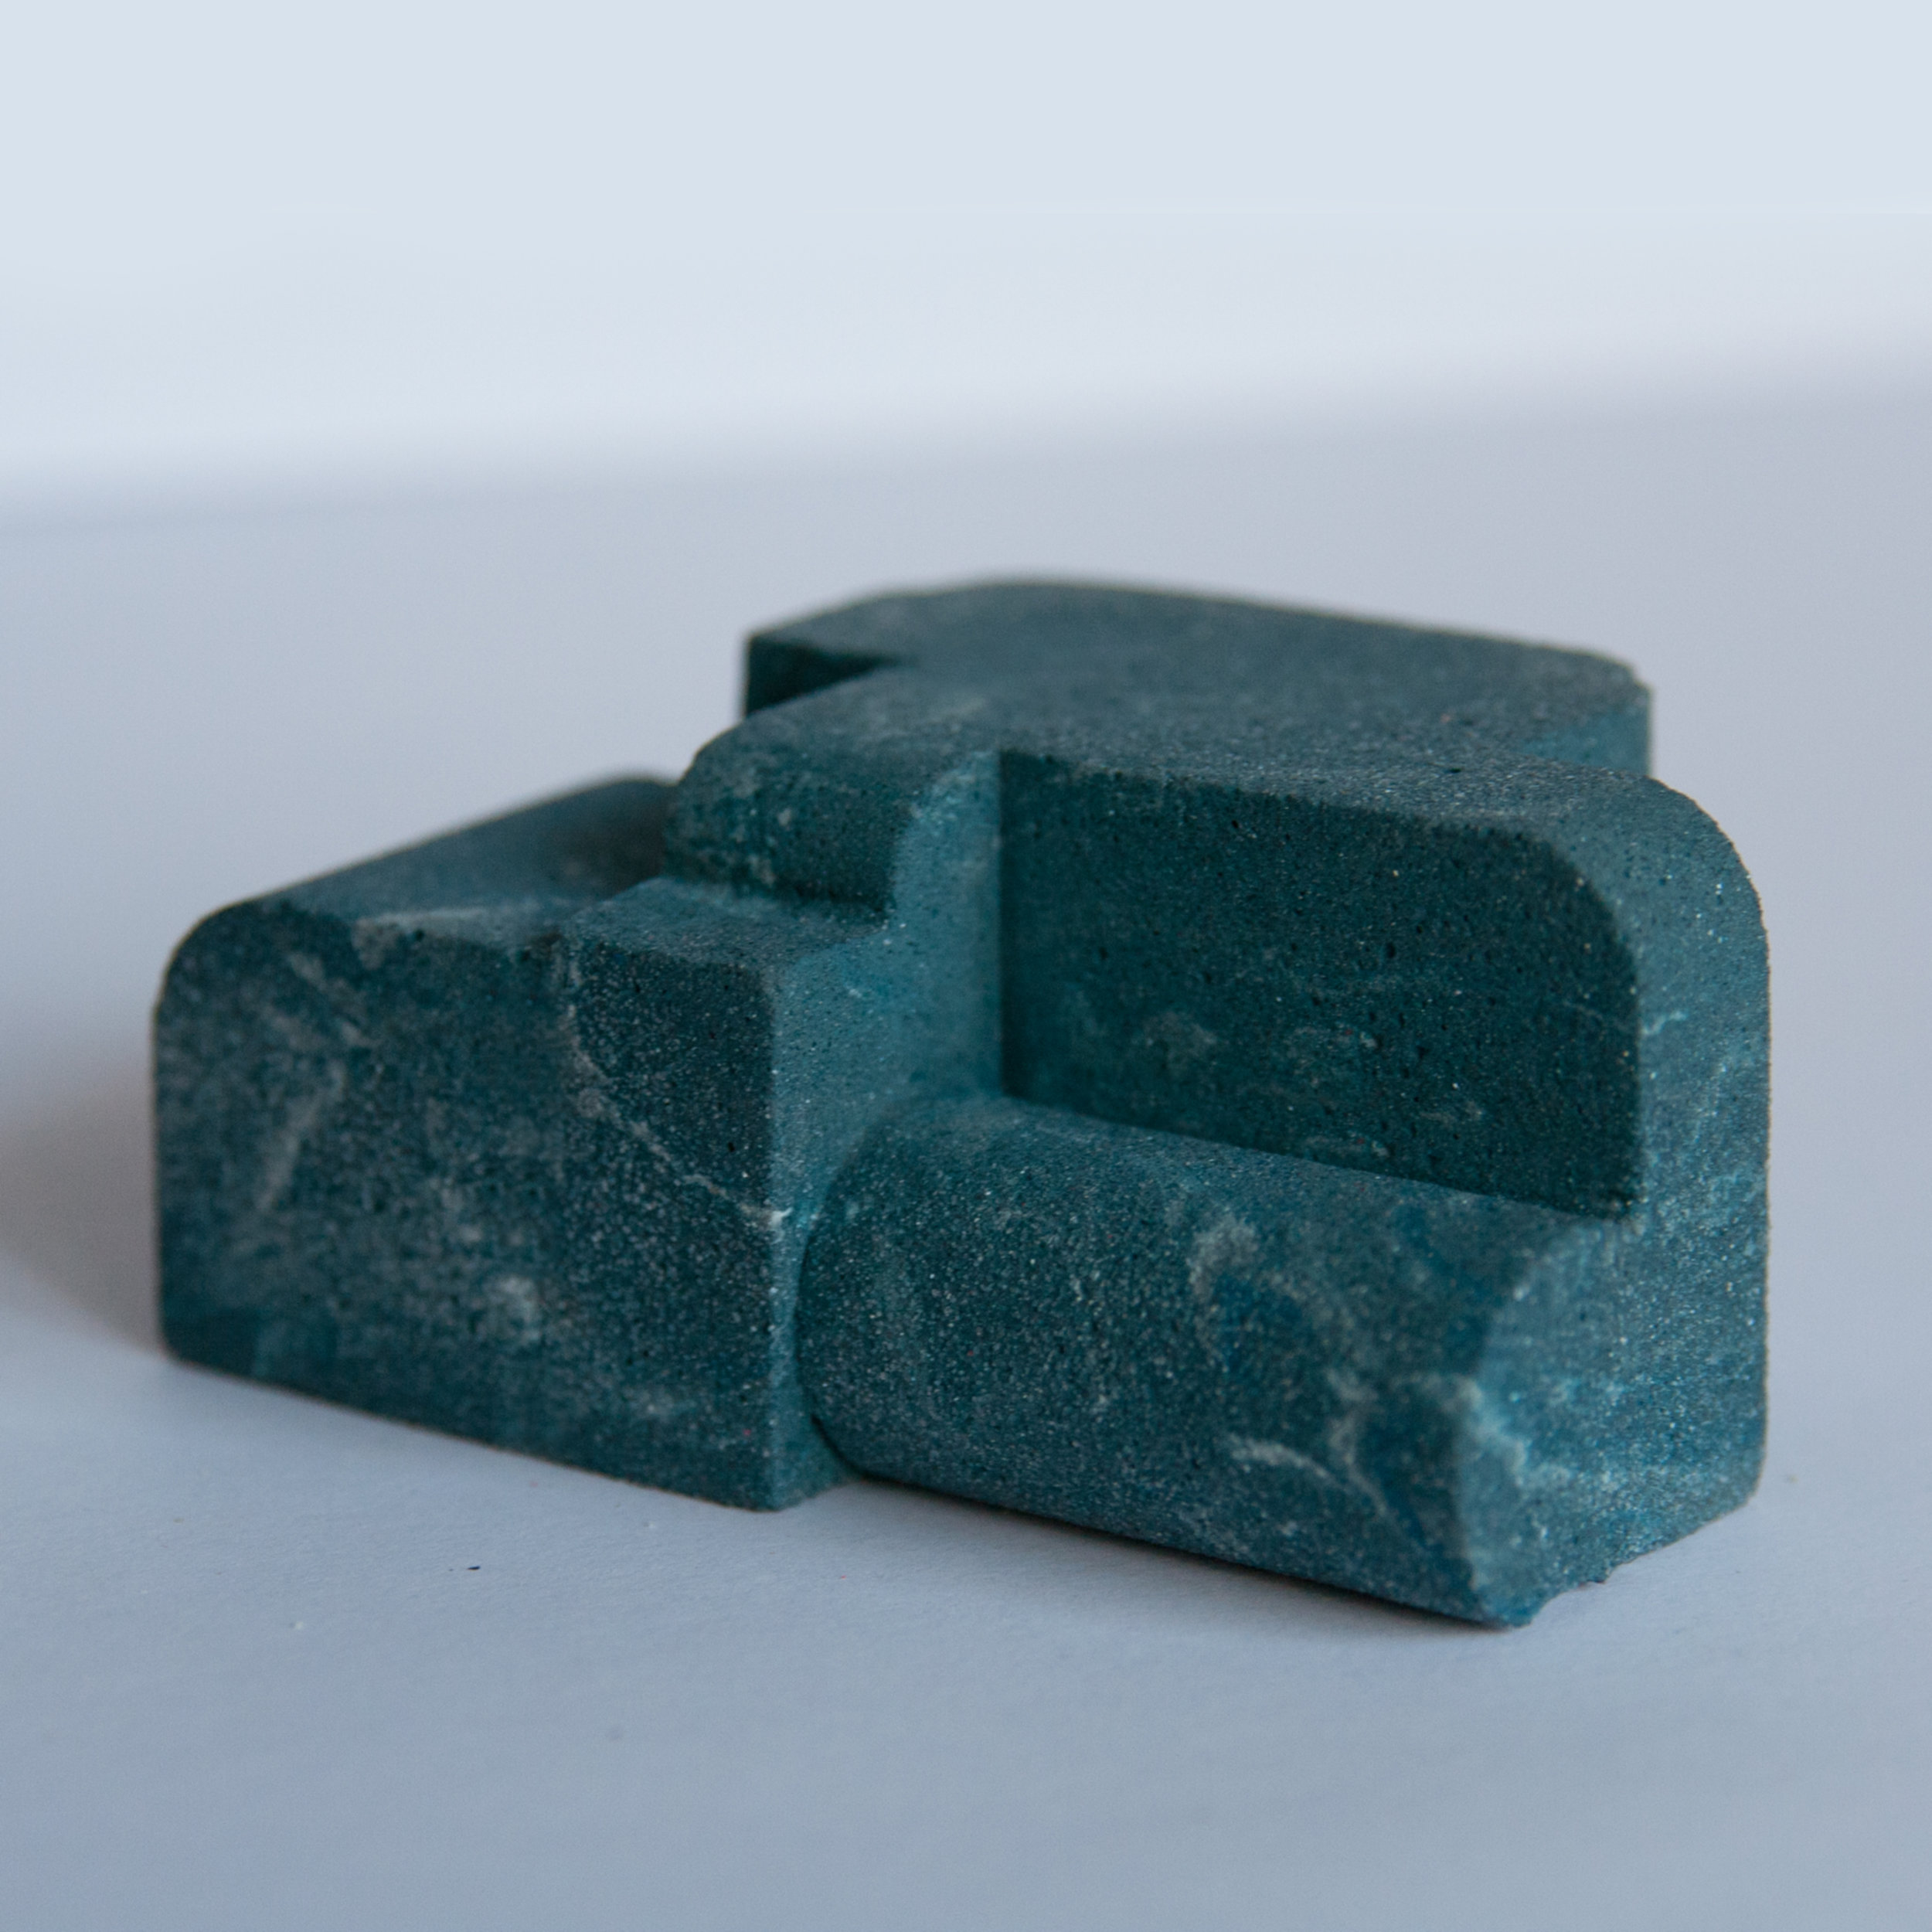 Pigmented marble aggregate jesmonite